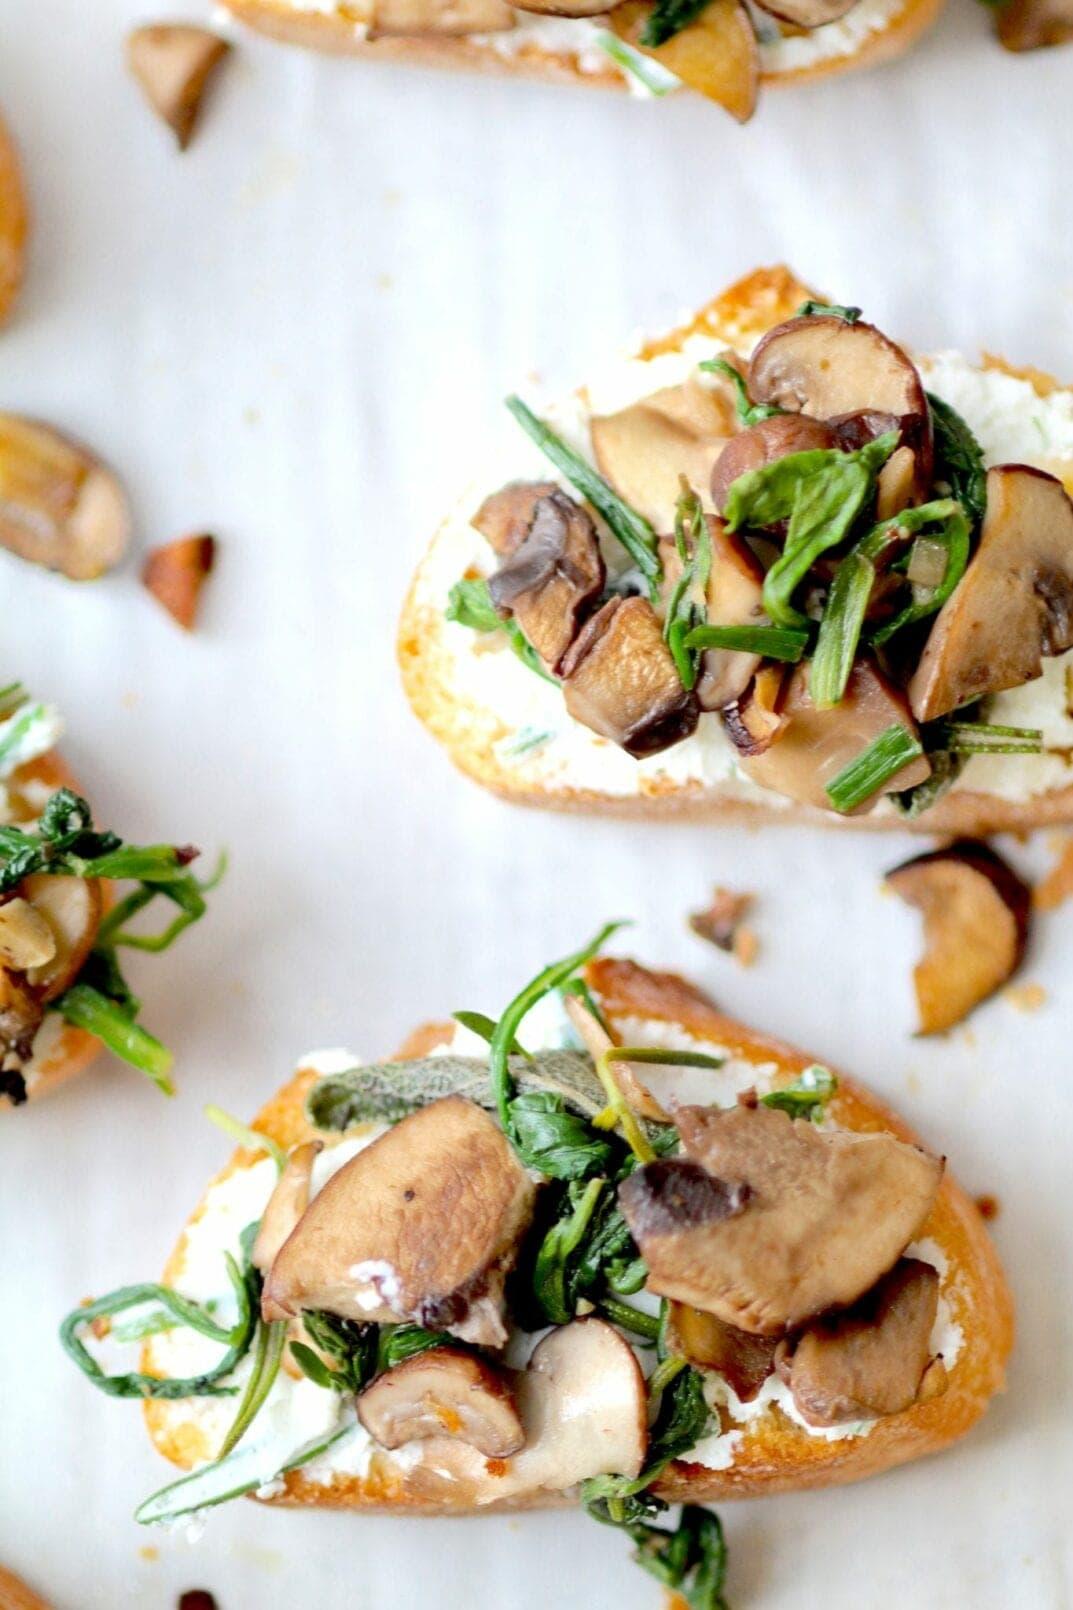 simple herb roasted mushroom + goat cheese crostini   www.nourishmovelove.com